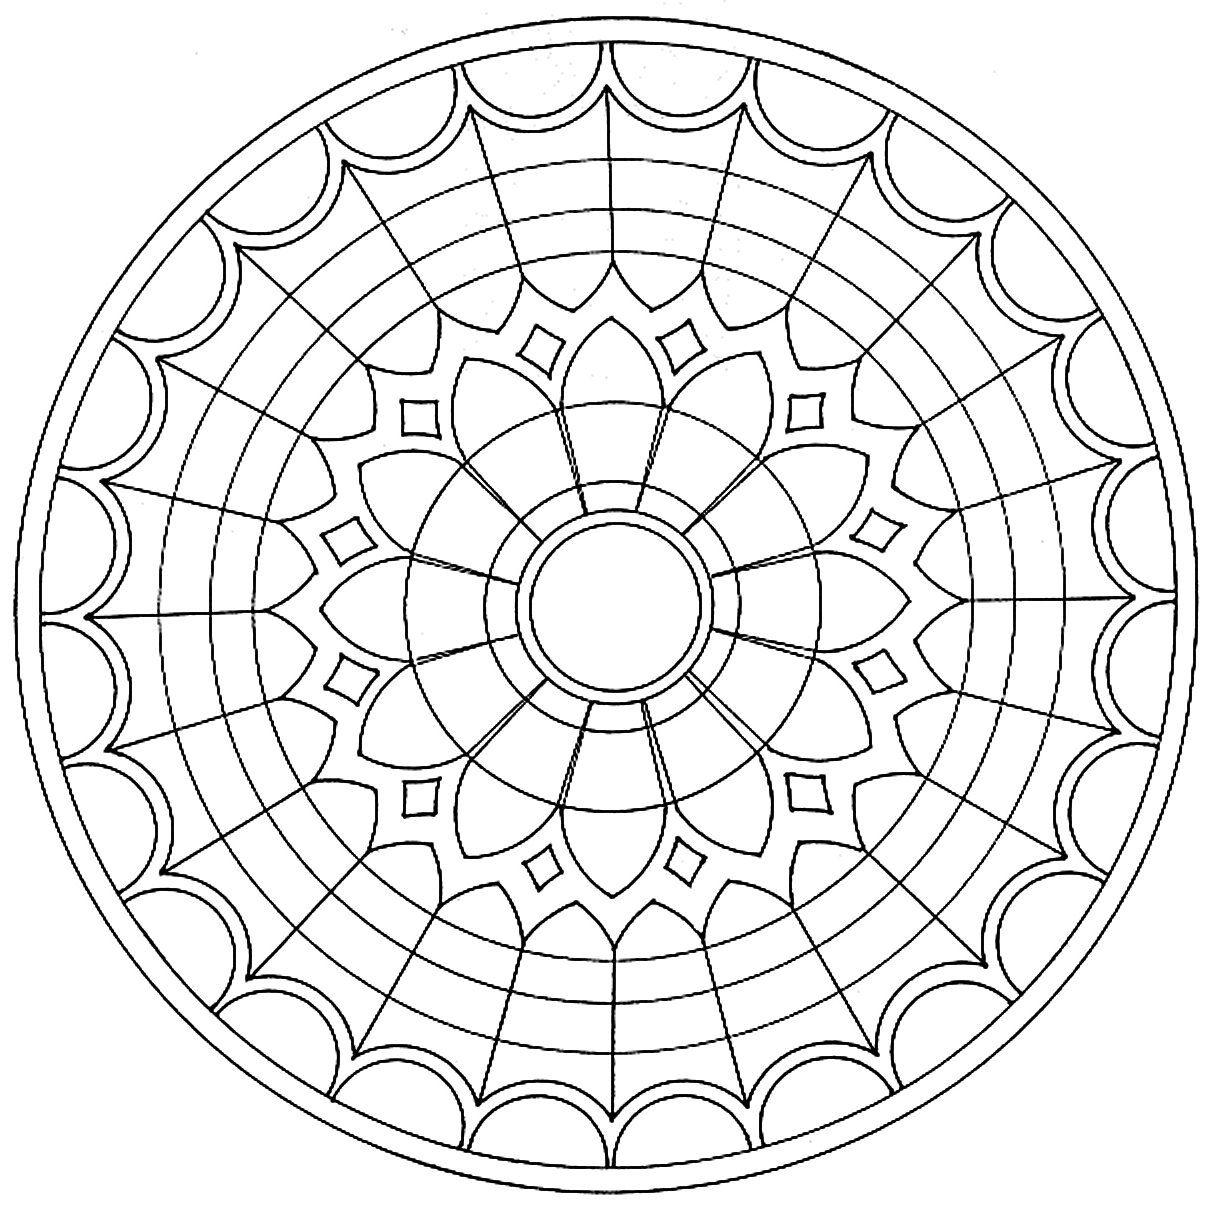 mandala_18.jpg (1212×1216) | Planar | Pinterest | Mandala vorlagen ...